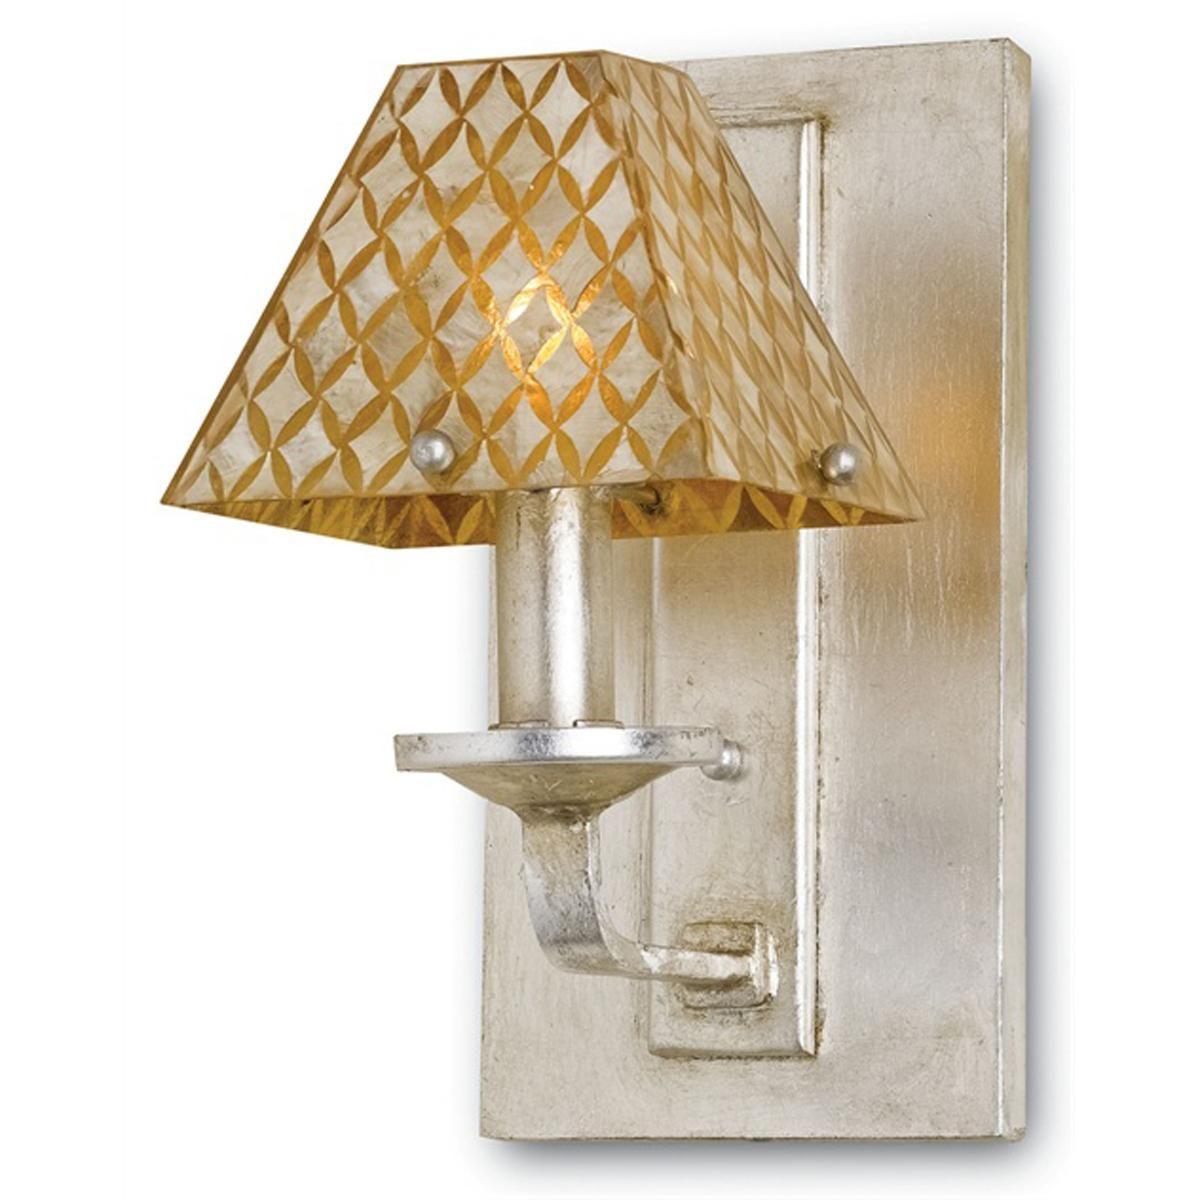 Iron and capiz shell wall sconce lighting pinterest decorative